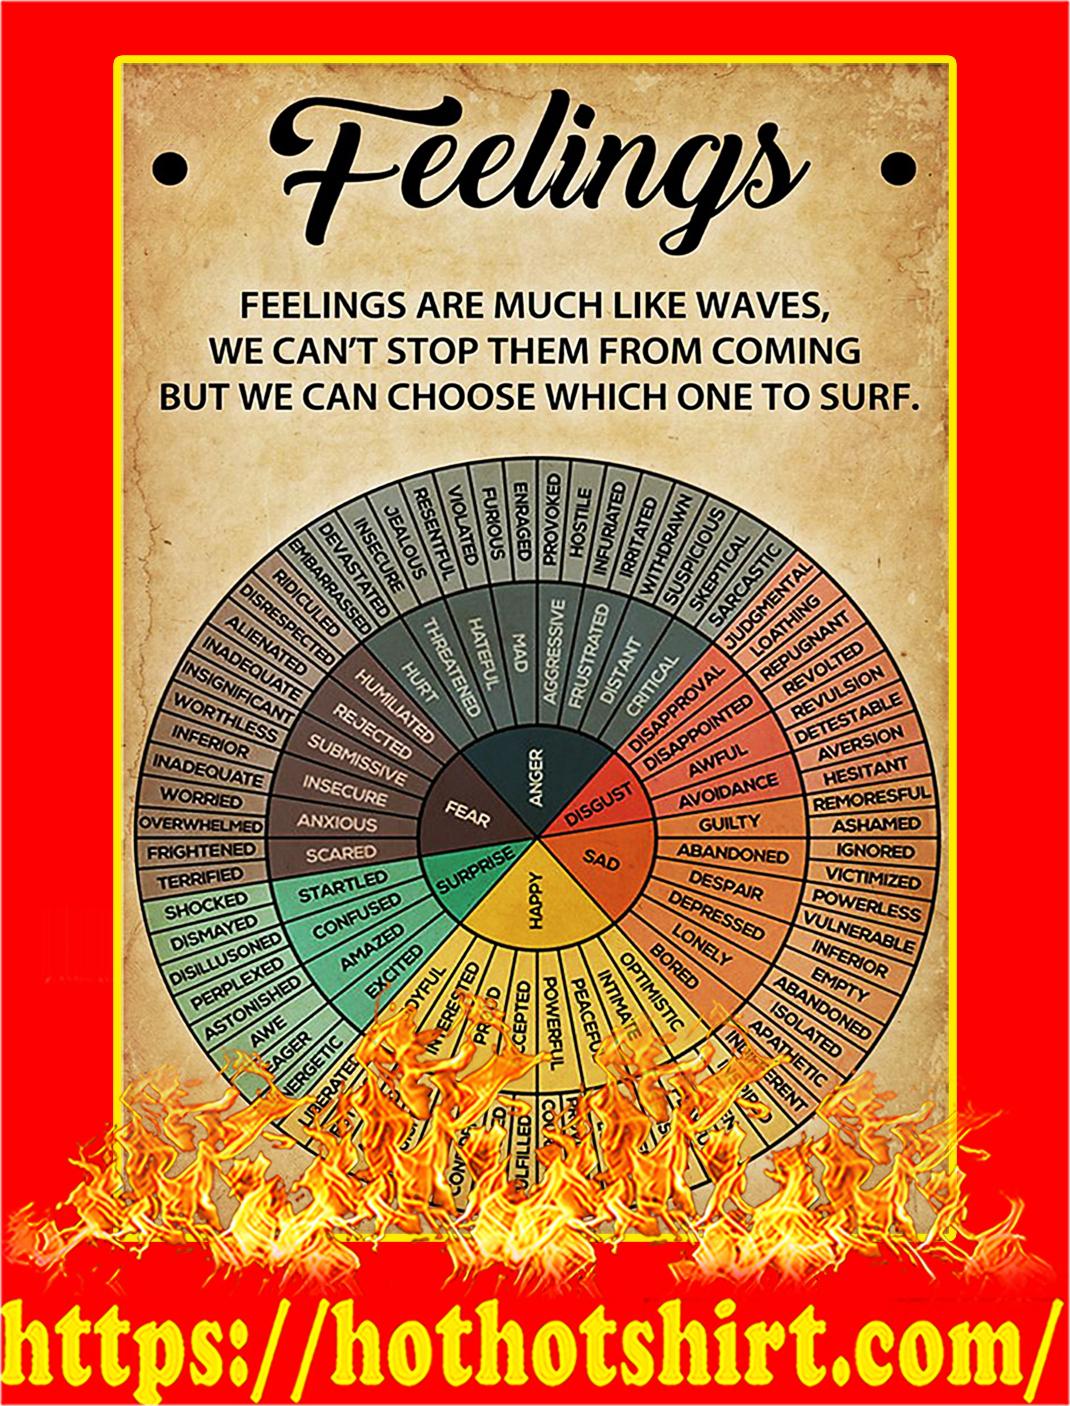 Feelings Wheel Feelings Are Much Like Waves Poster - A2